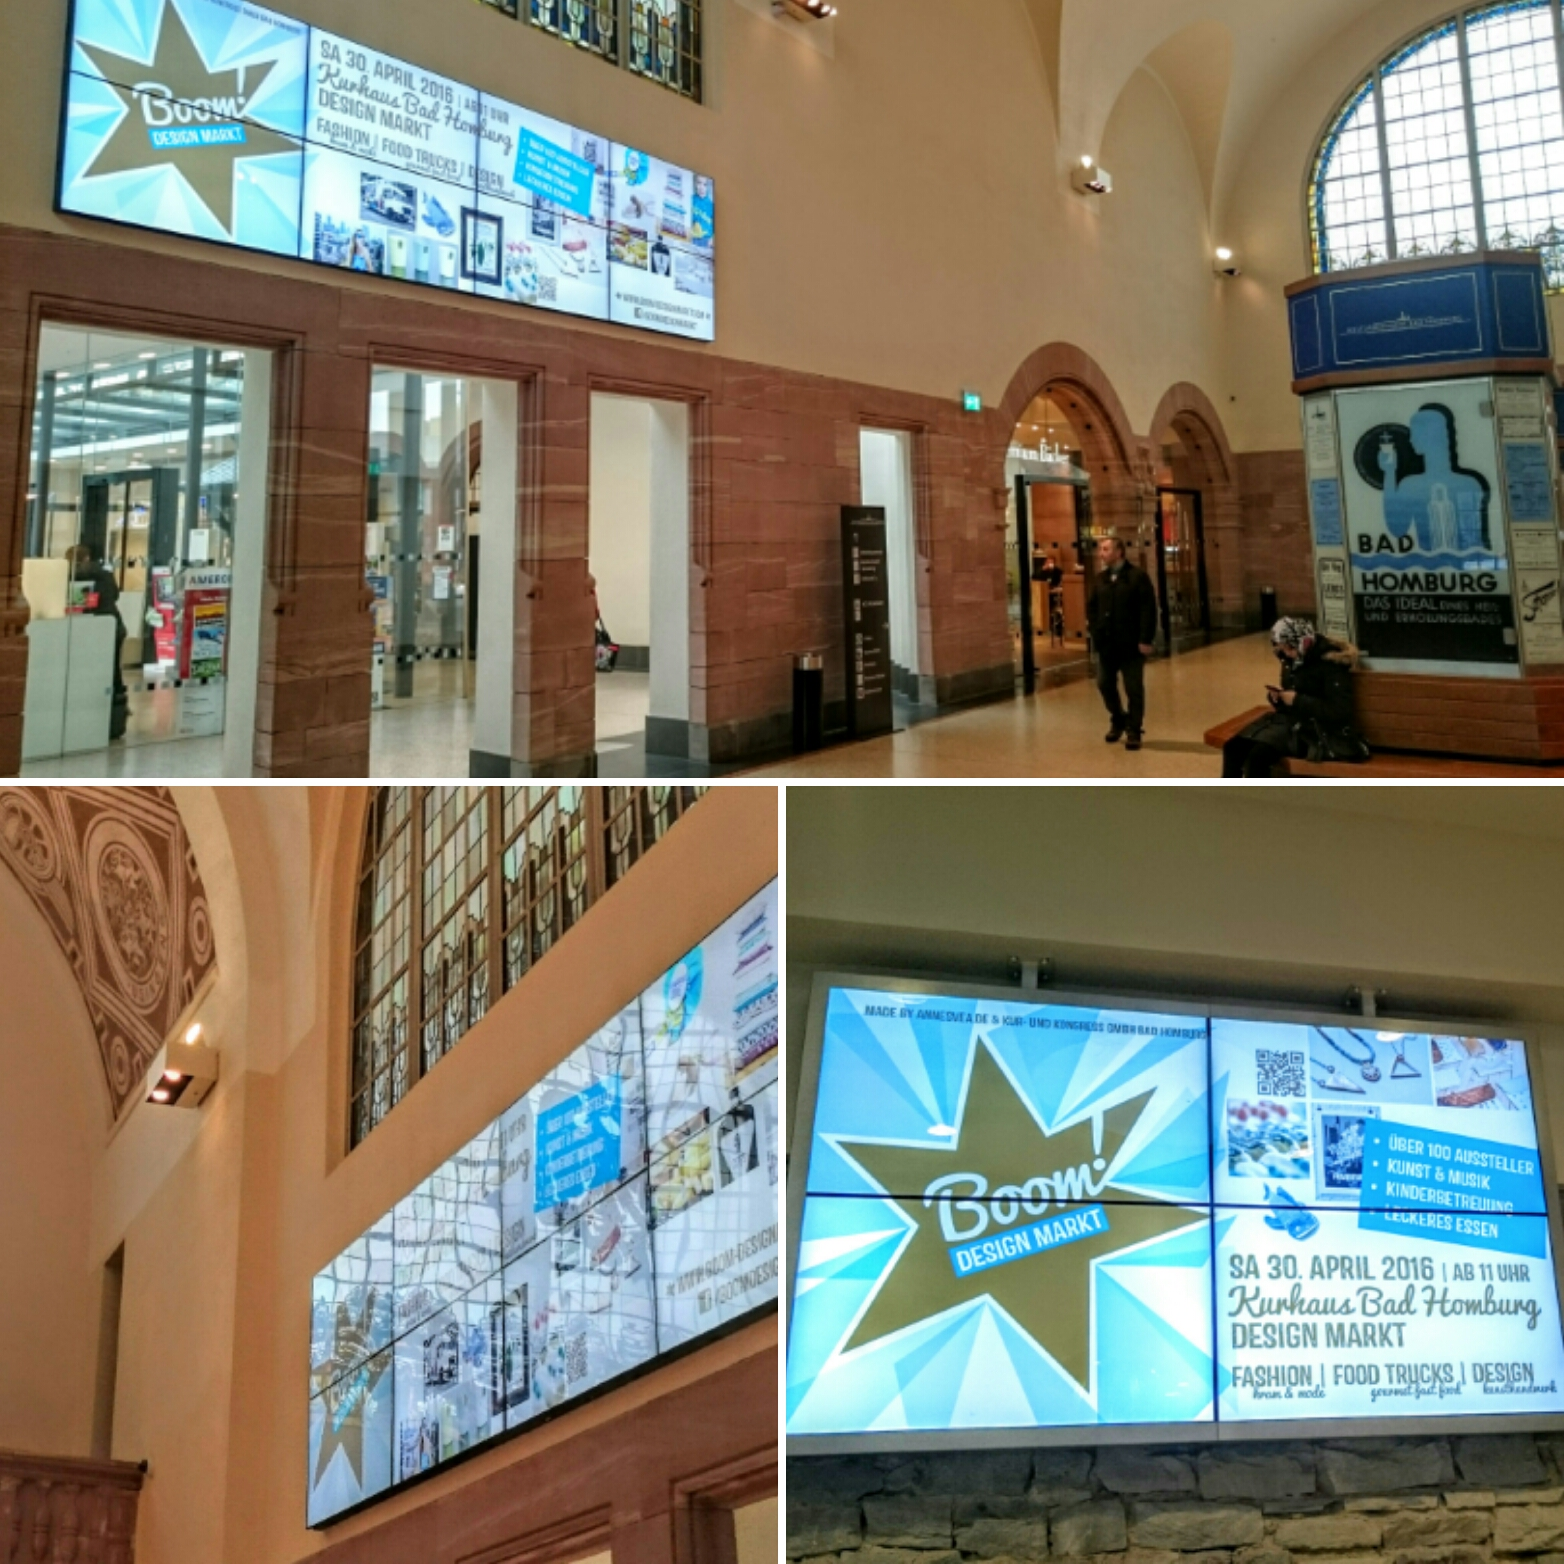 Videowerbung im Kulturbahnhof